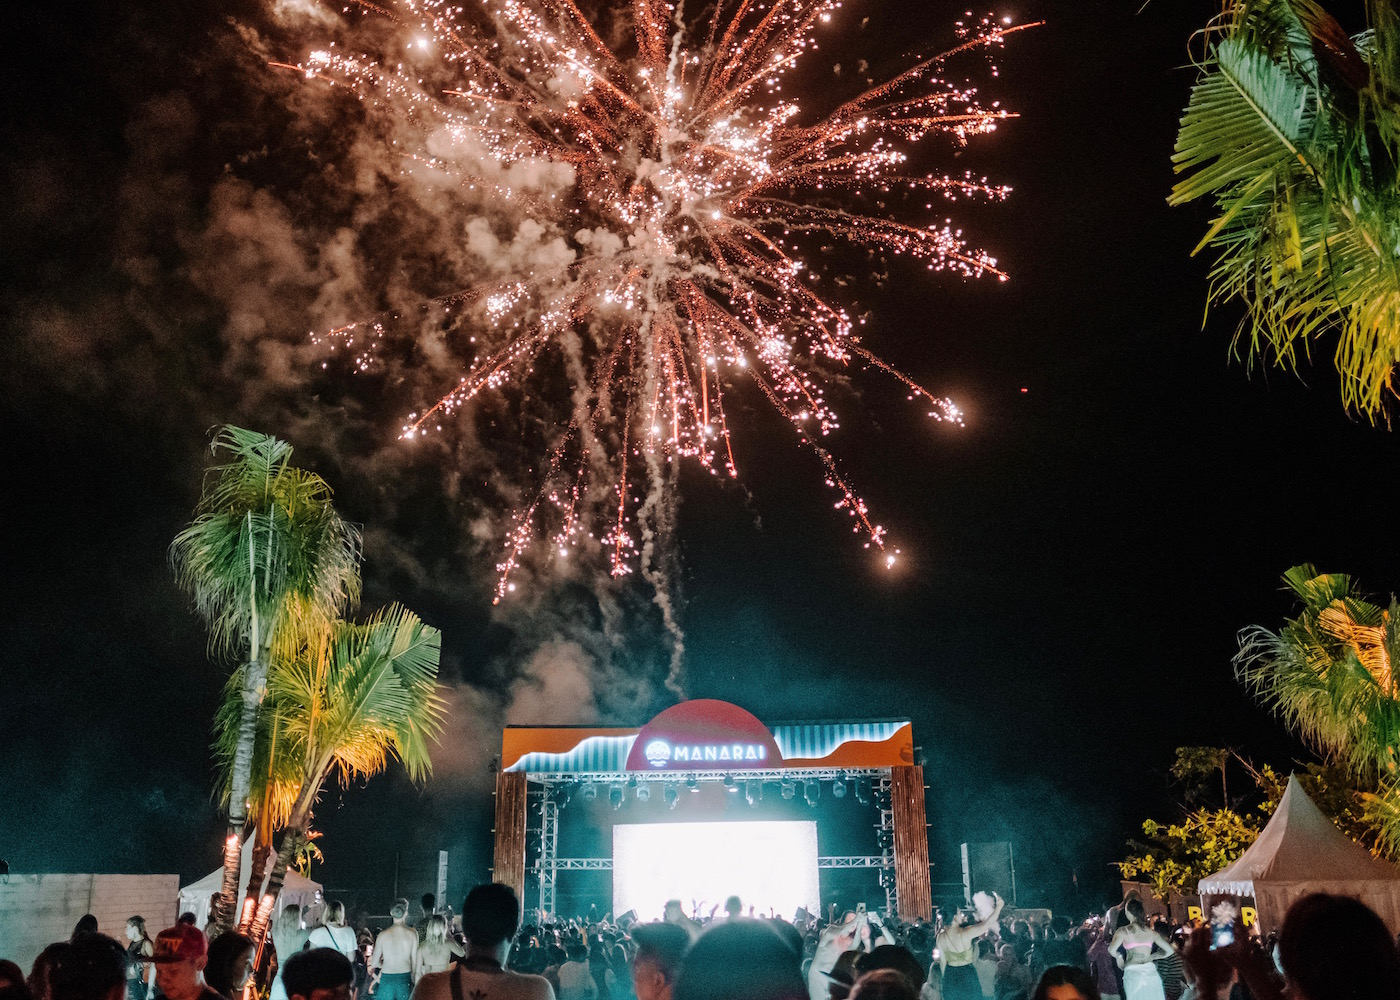 Music, culture, and a Carnival of Rhythm - celebrate New Year's Eve at Manarai Beach House!